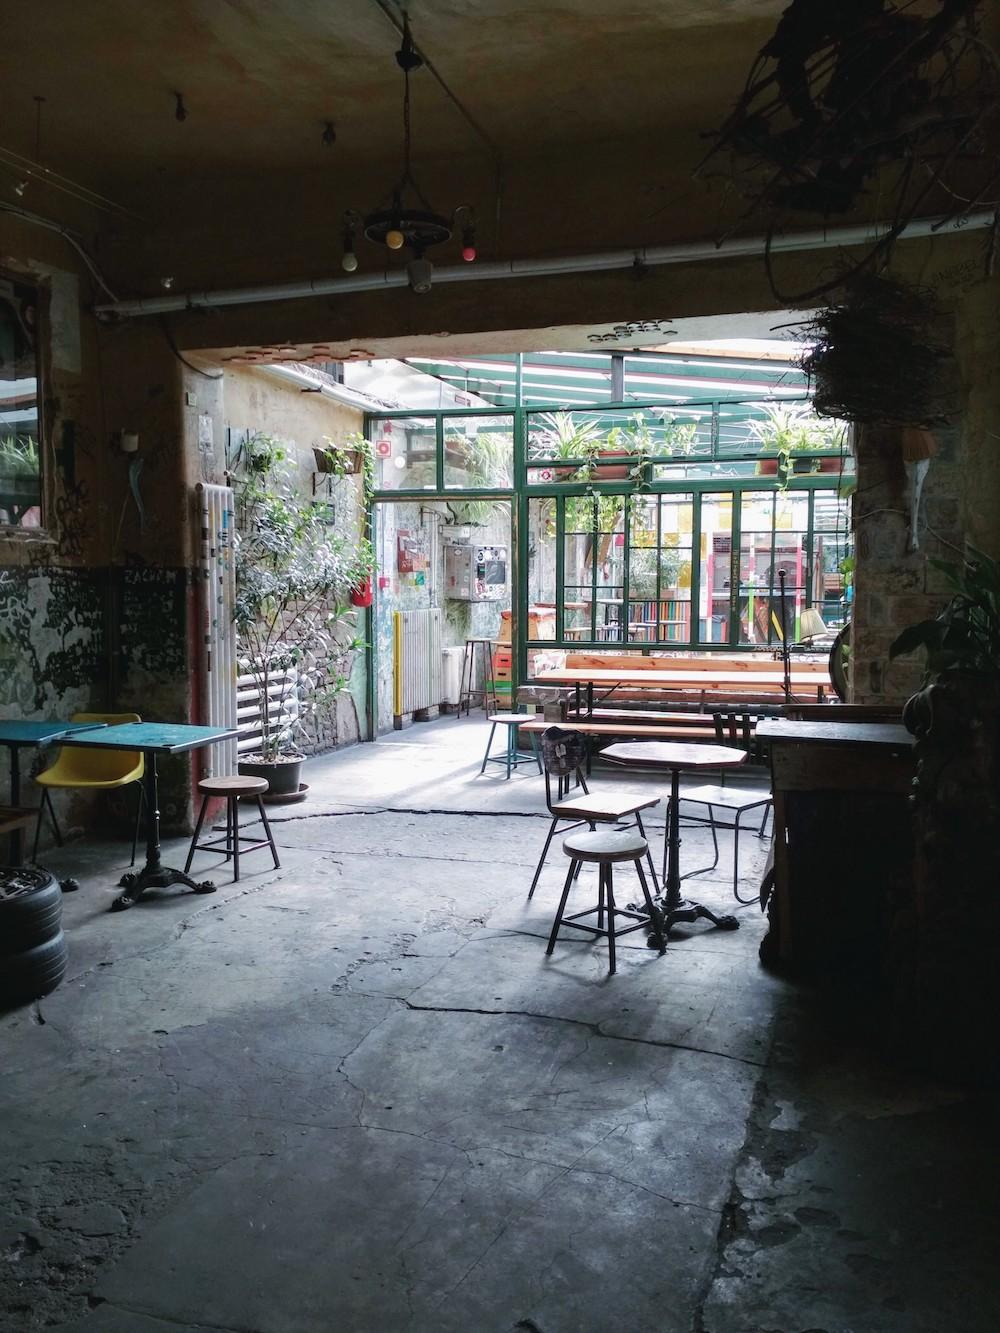 szimpla kert budapest bonnes adresses ruin bars